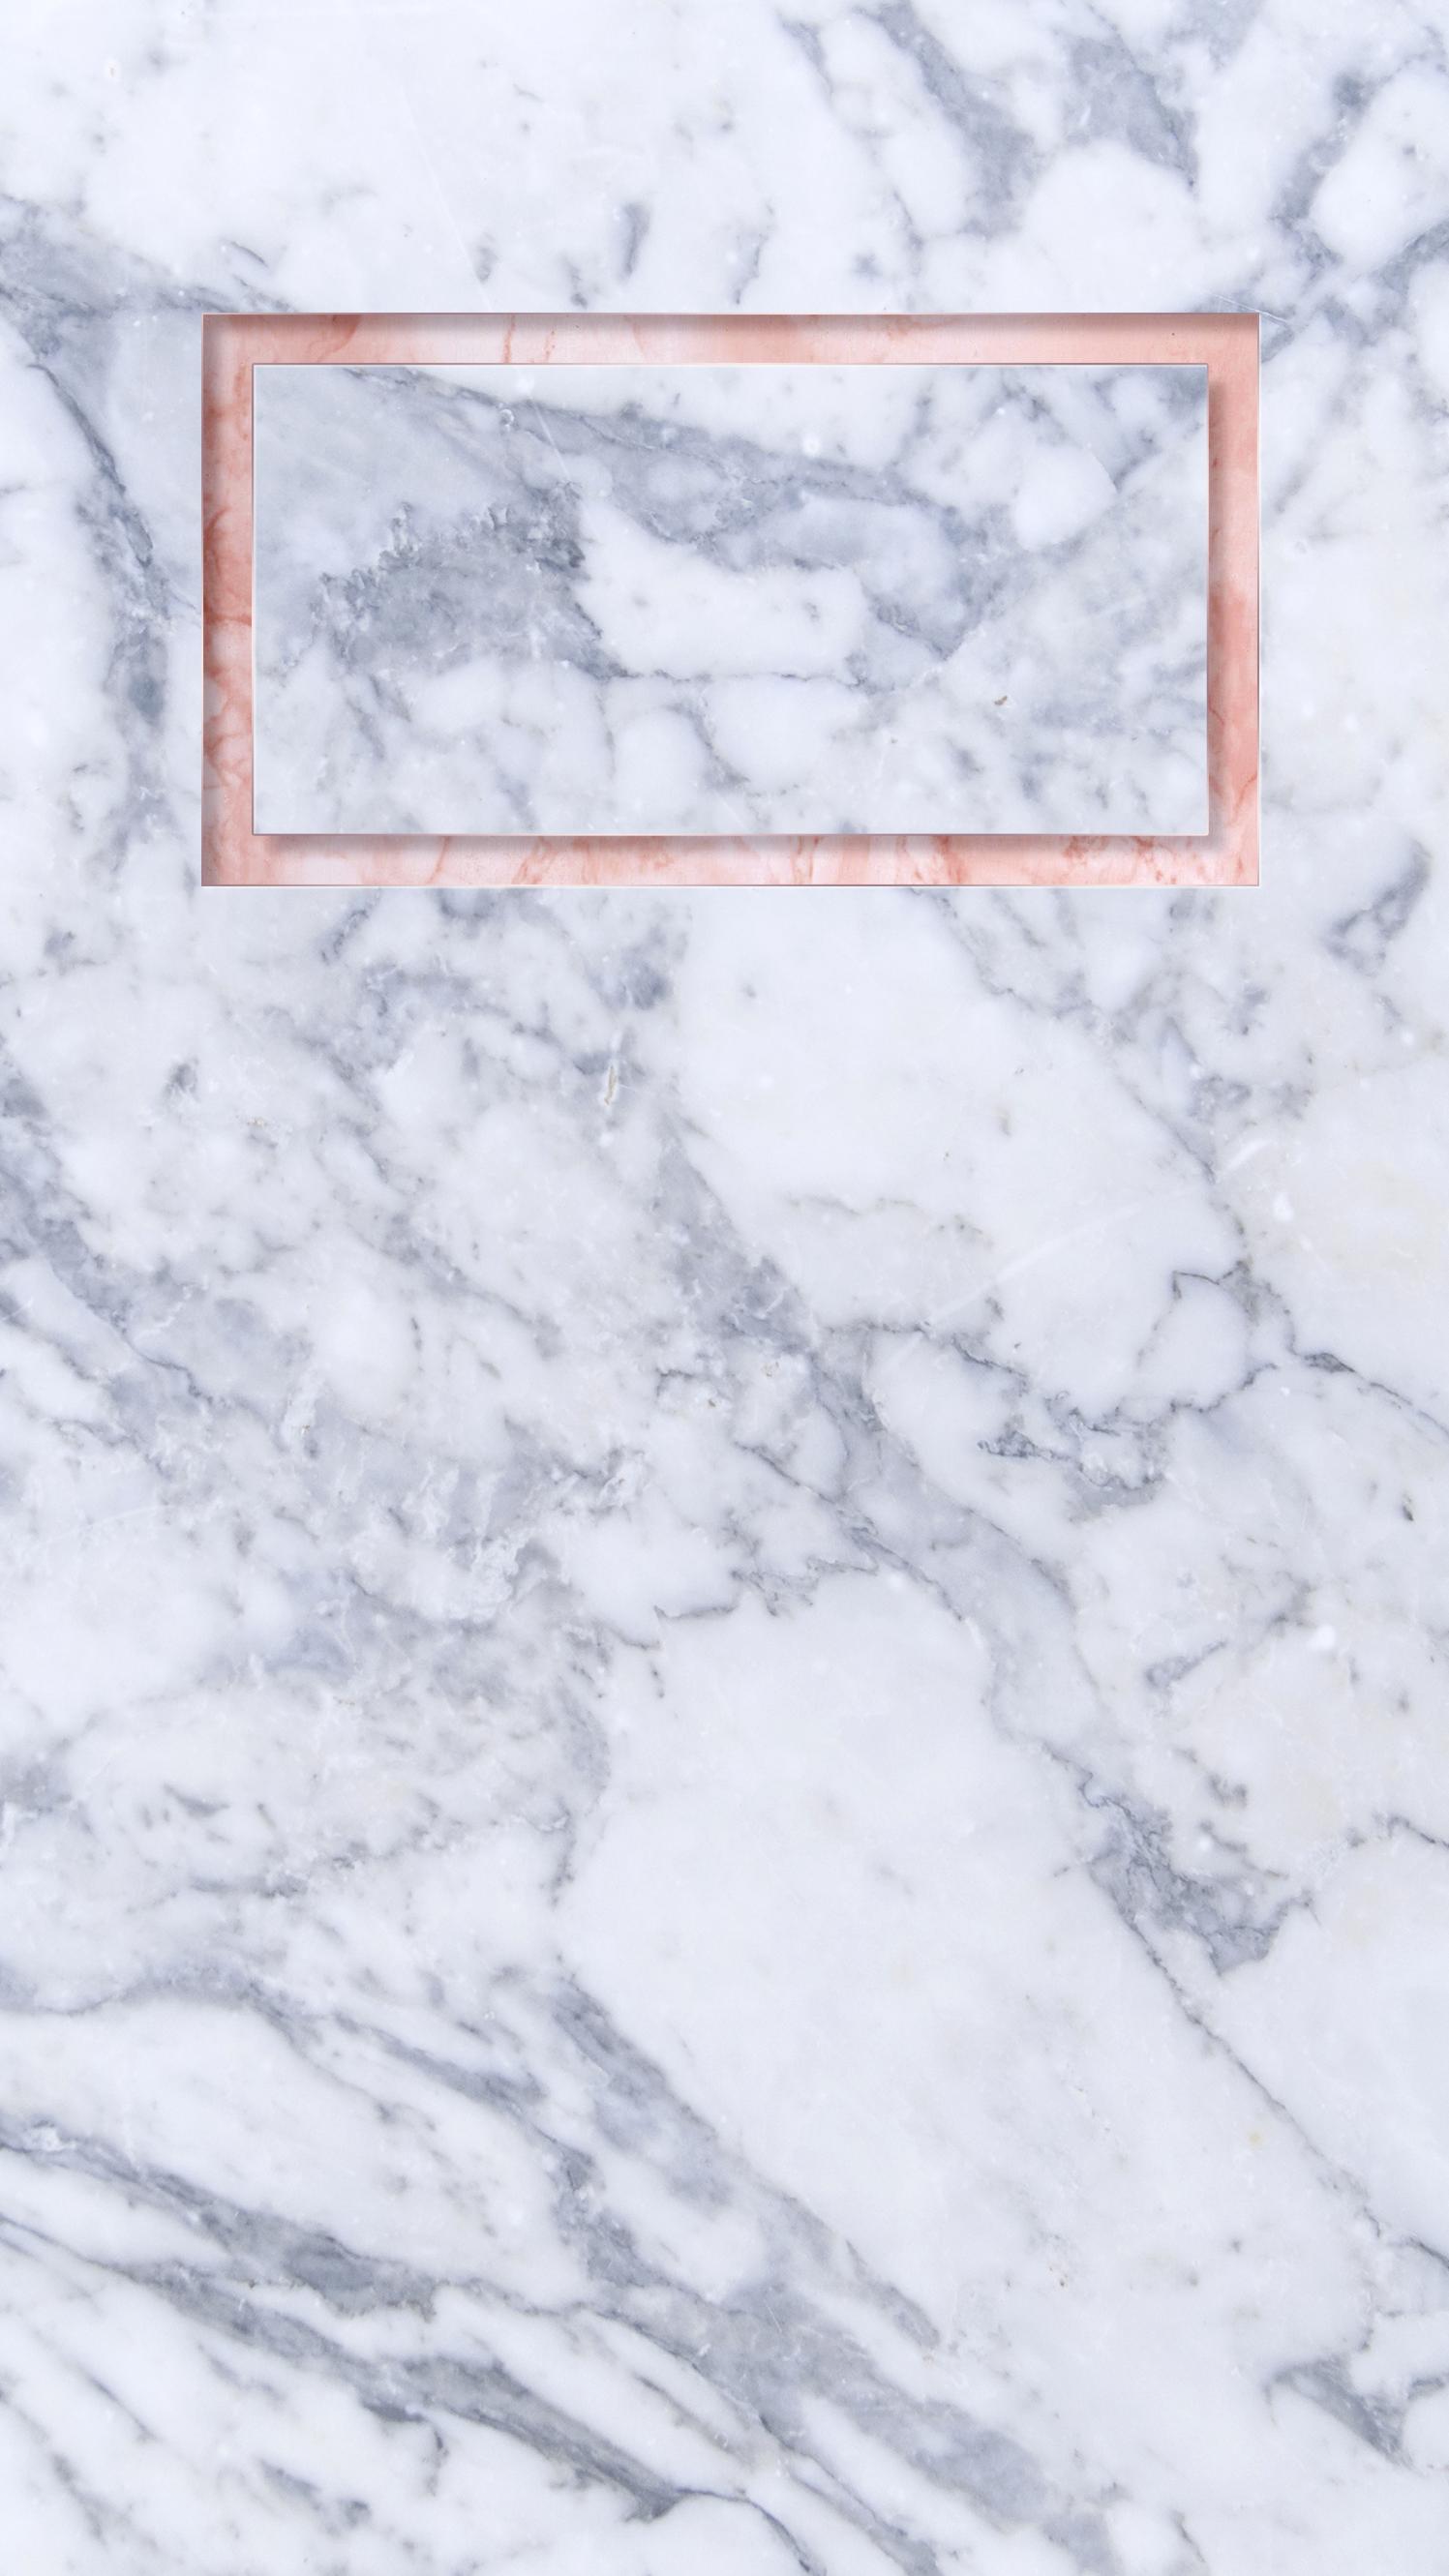 Cute Aesthetic Rose Gold Marble Iphone Lock Screen Wallpaper Phone Wallpapers